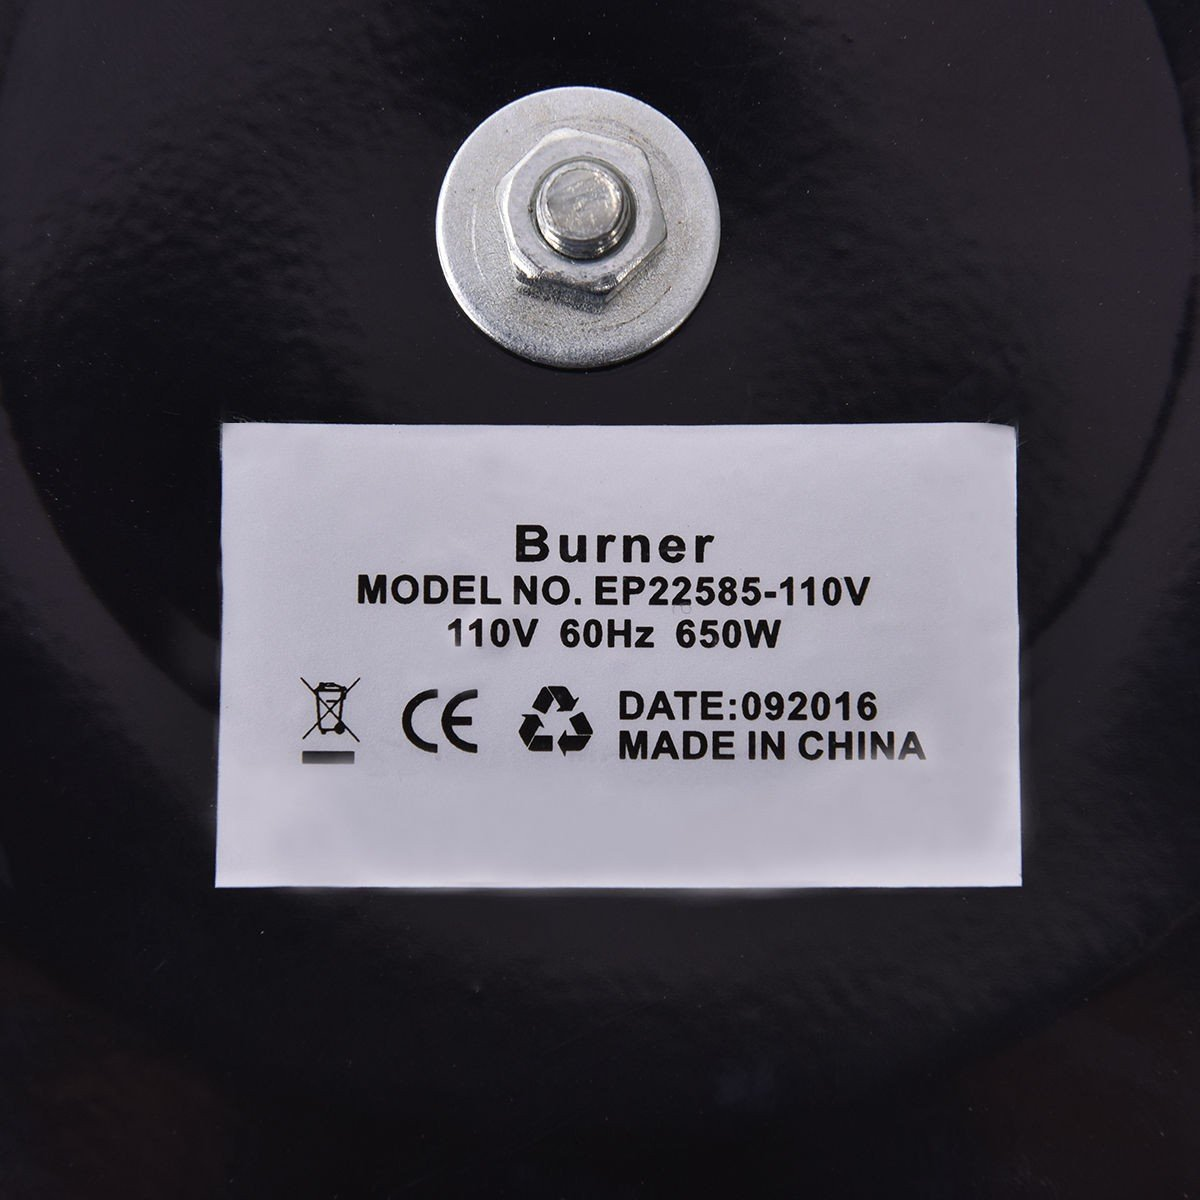 Electric Charcoal Starter Hookah Shisha Nargila Heater Stove Charcoal Burner Costway by COSTWAY (Image #8)